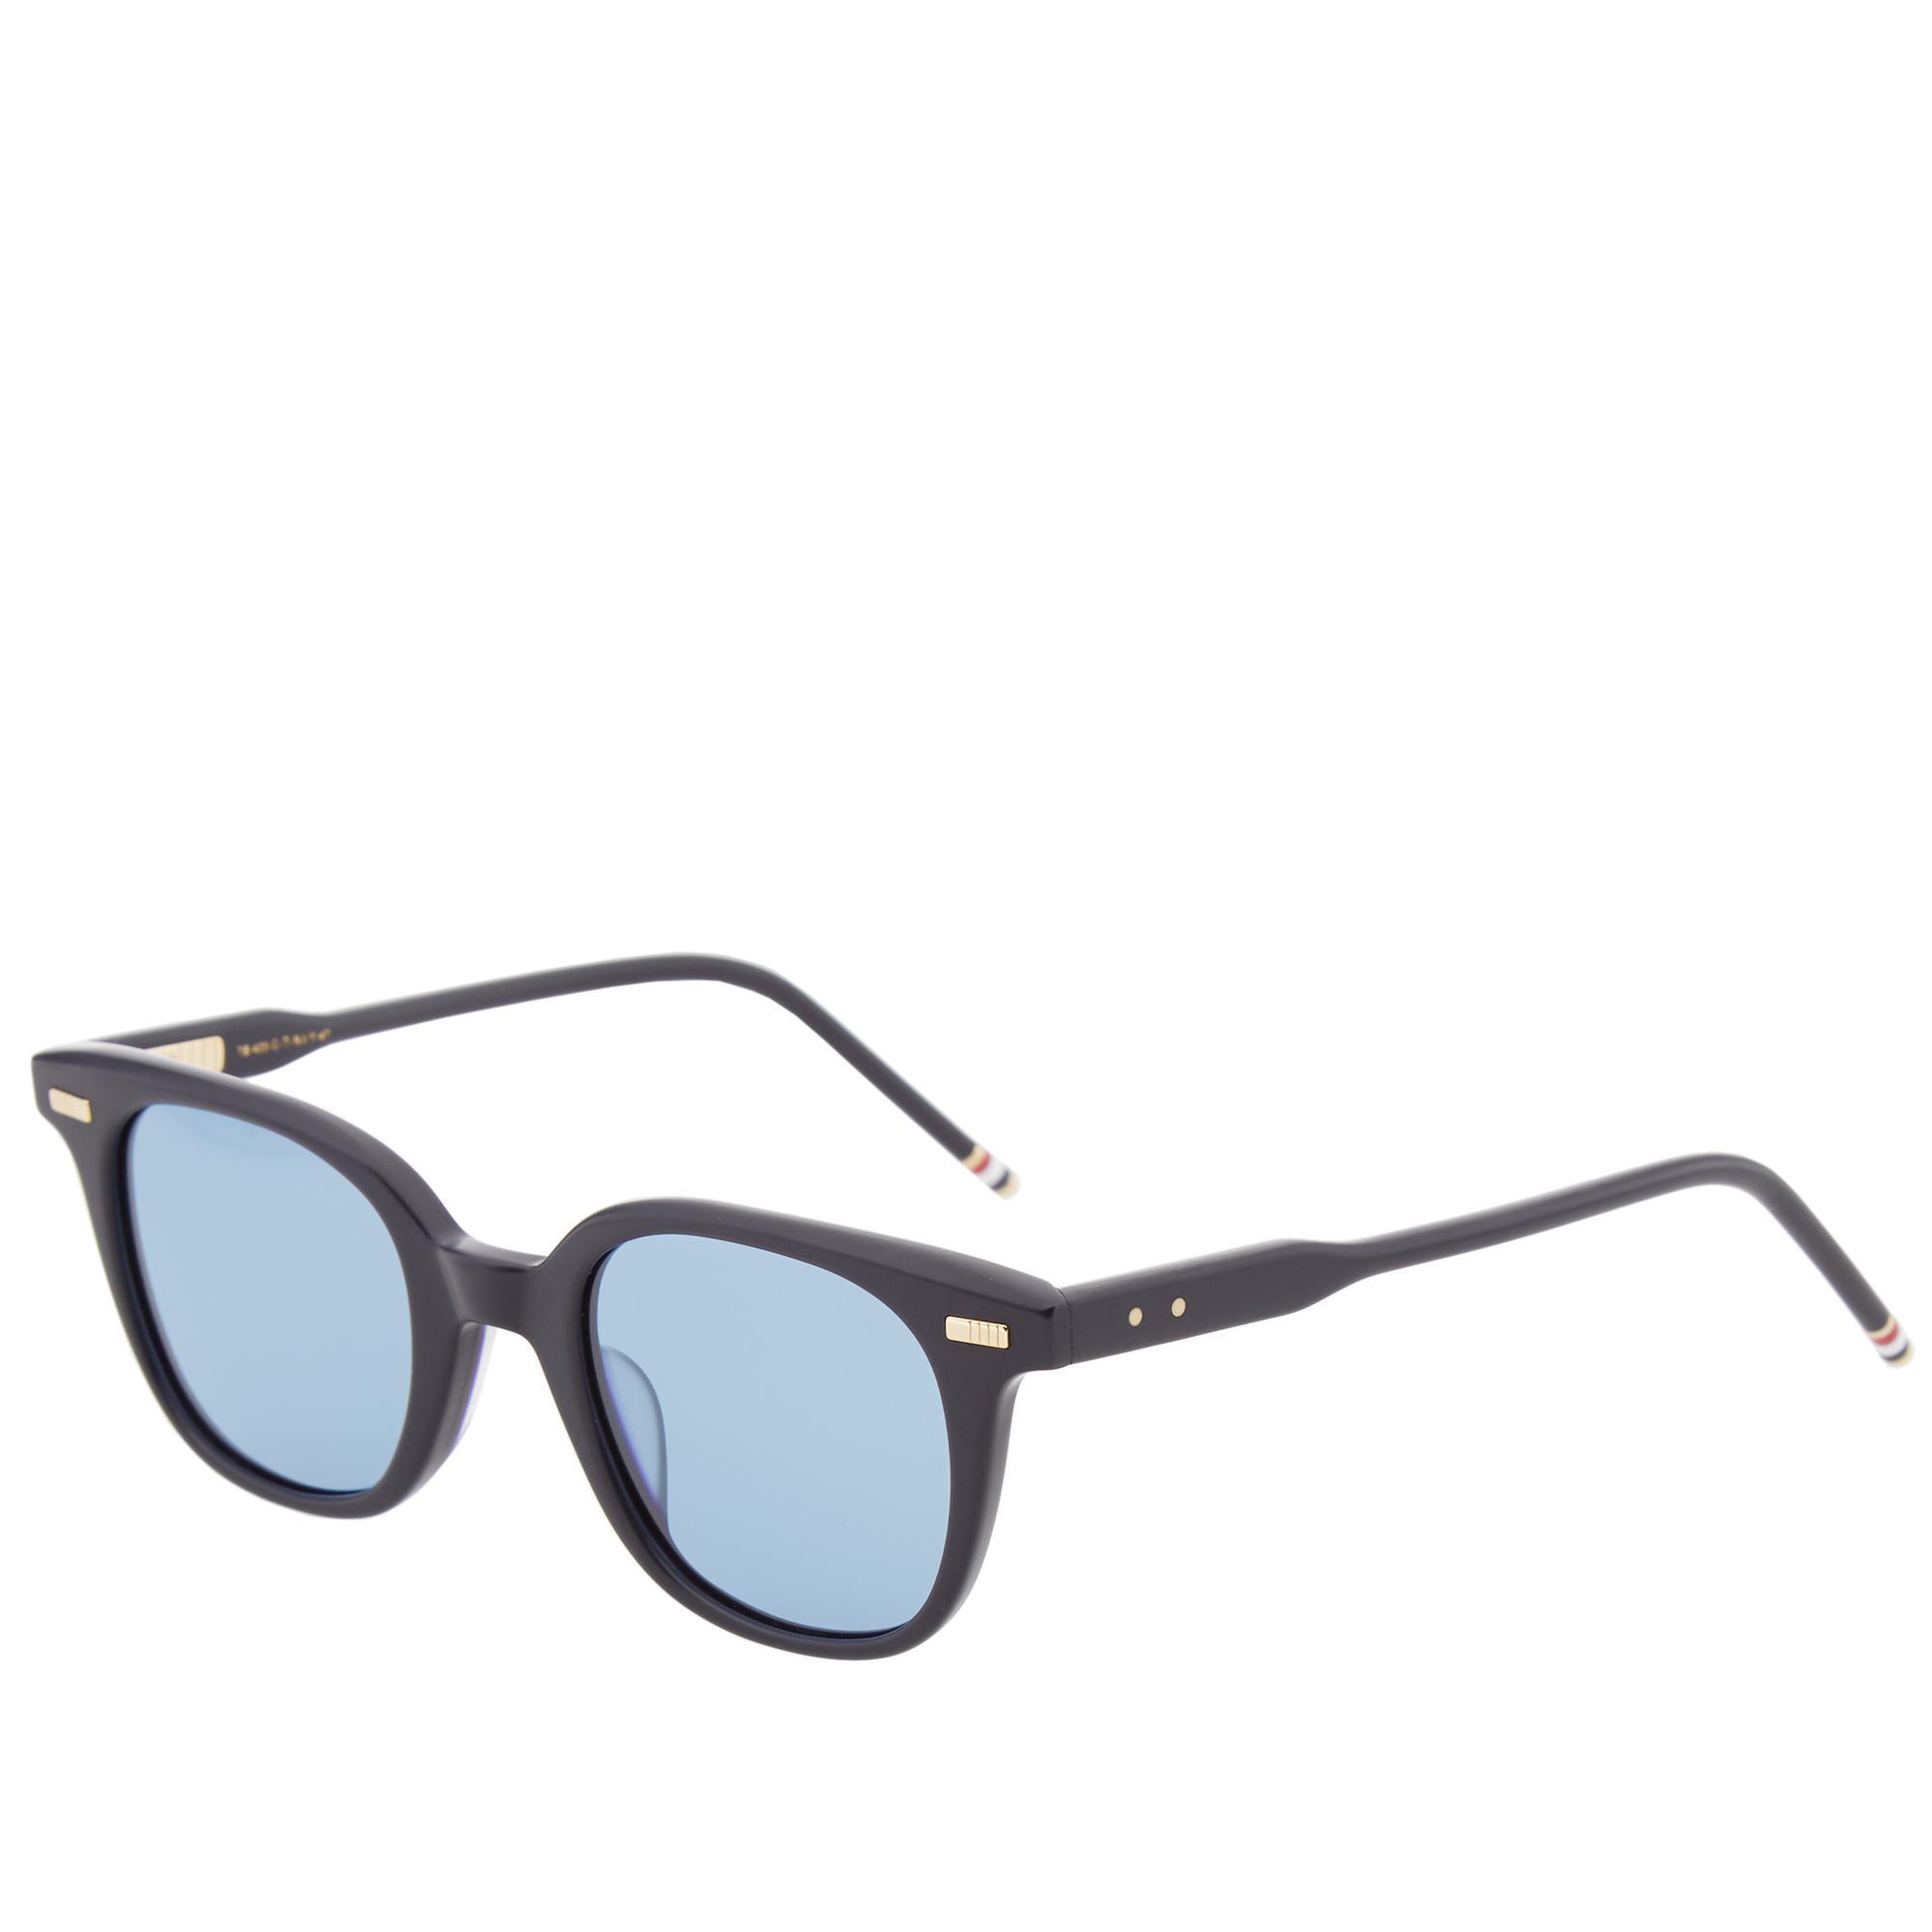 987946404f8 Thom Browne Tb-405 Sunglasses in Blue for Men - Lyst